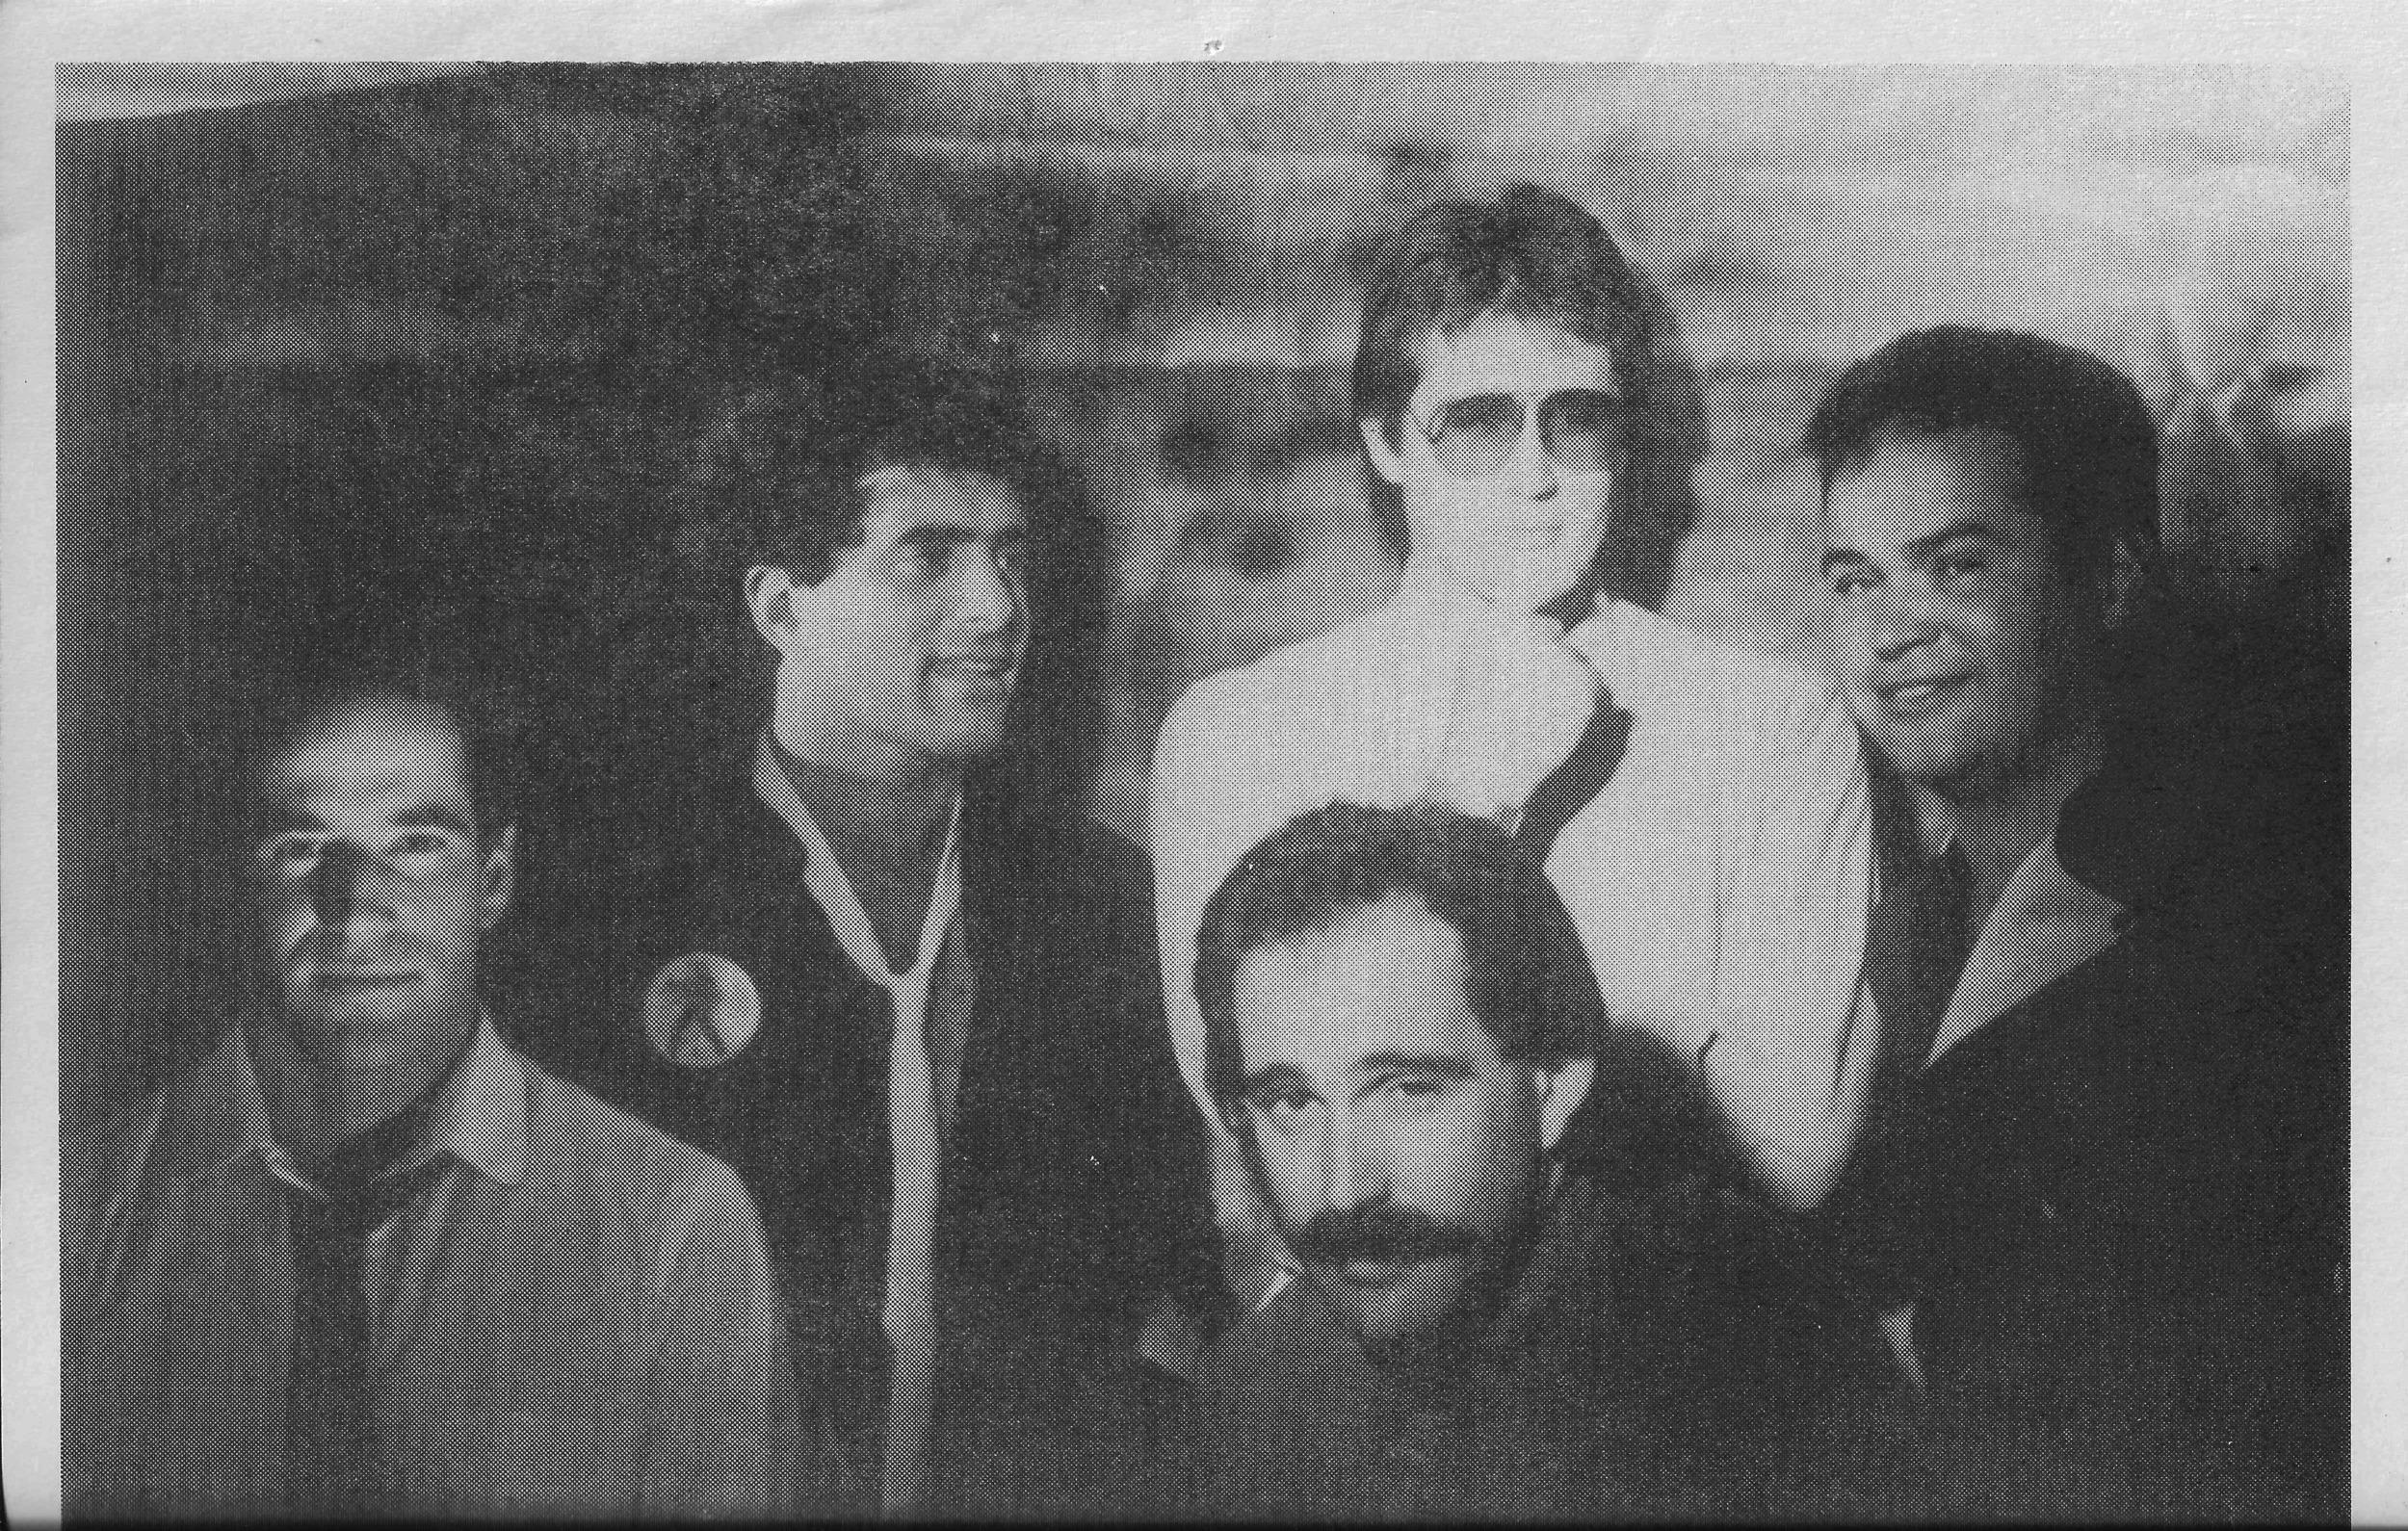 1985 L-R:Ian Greene, Tommy Nunes, John Holt, Evan Hiney, and Chet Hogoboom.